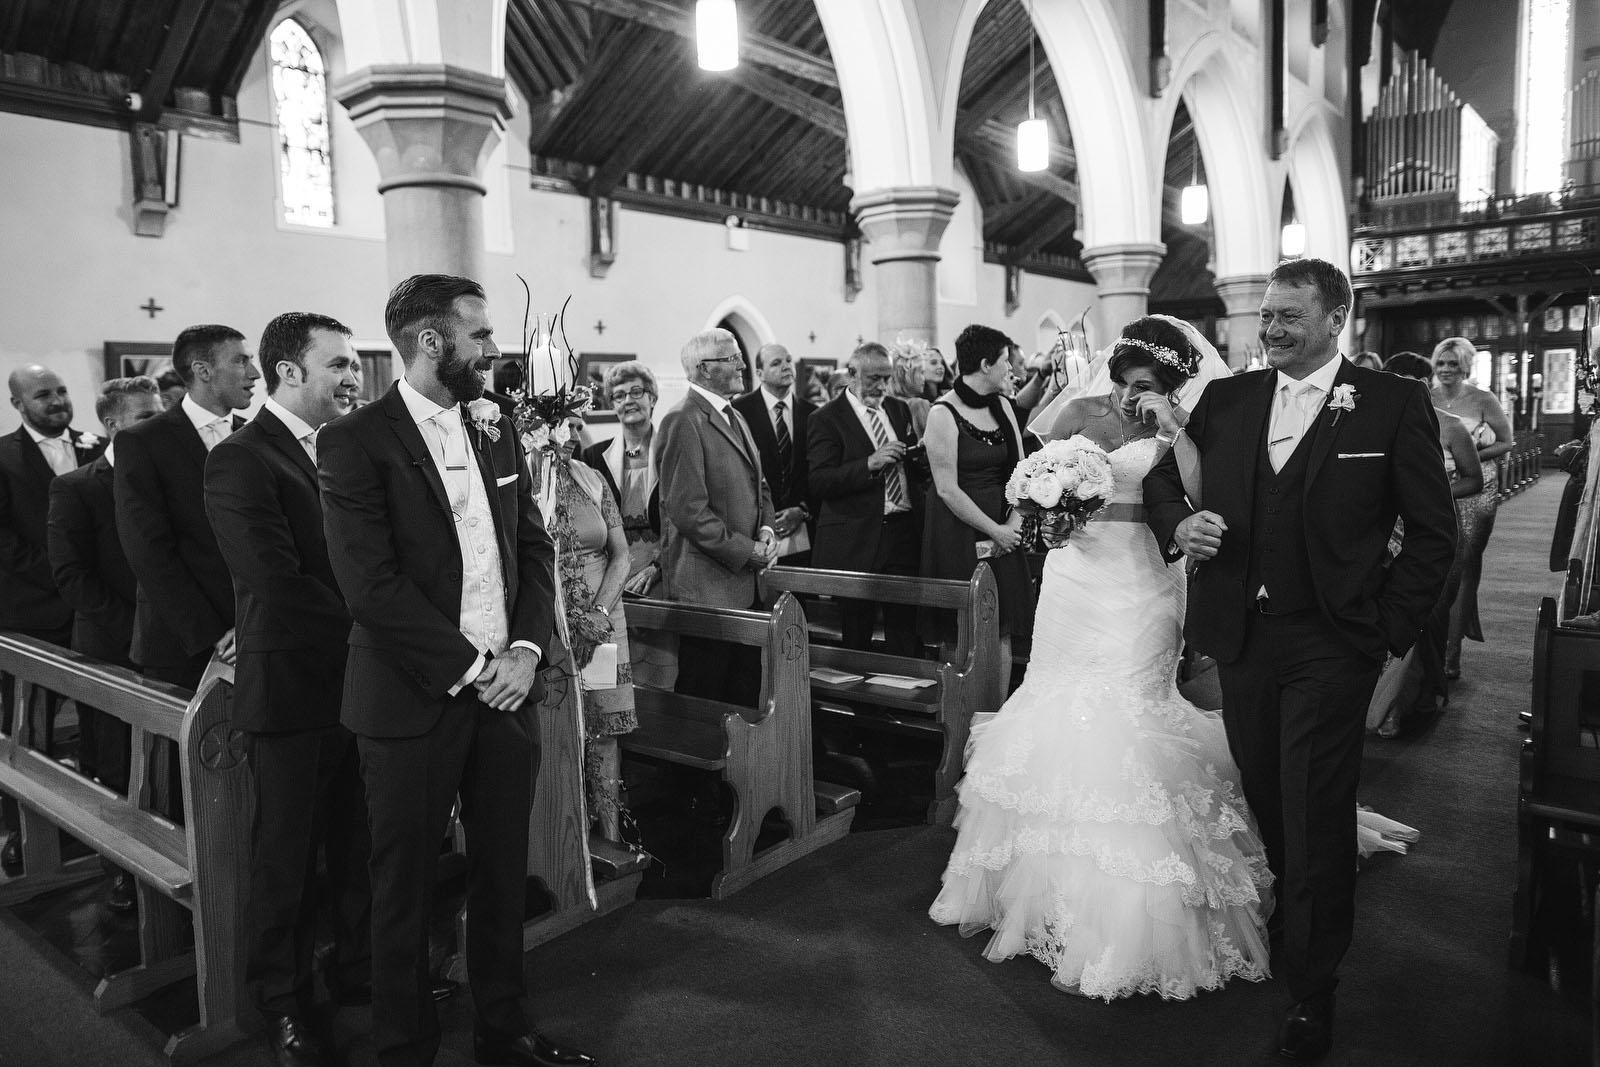 wedding church Ireland1